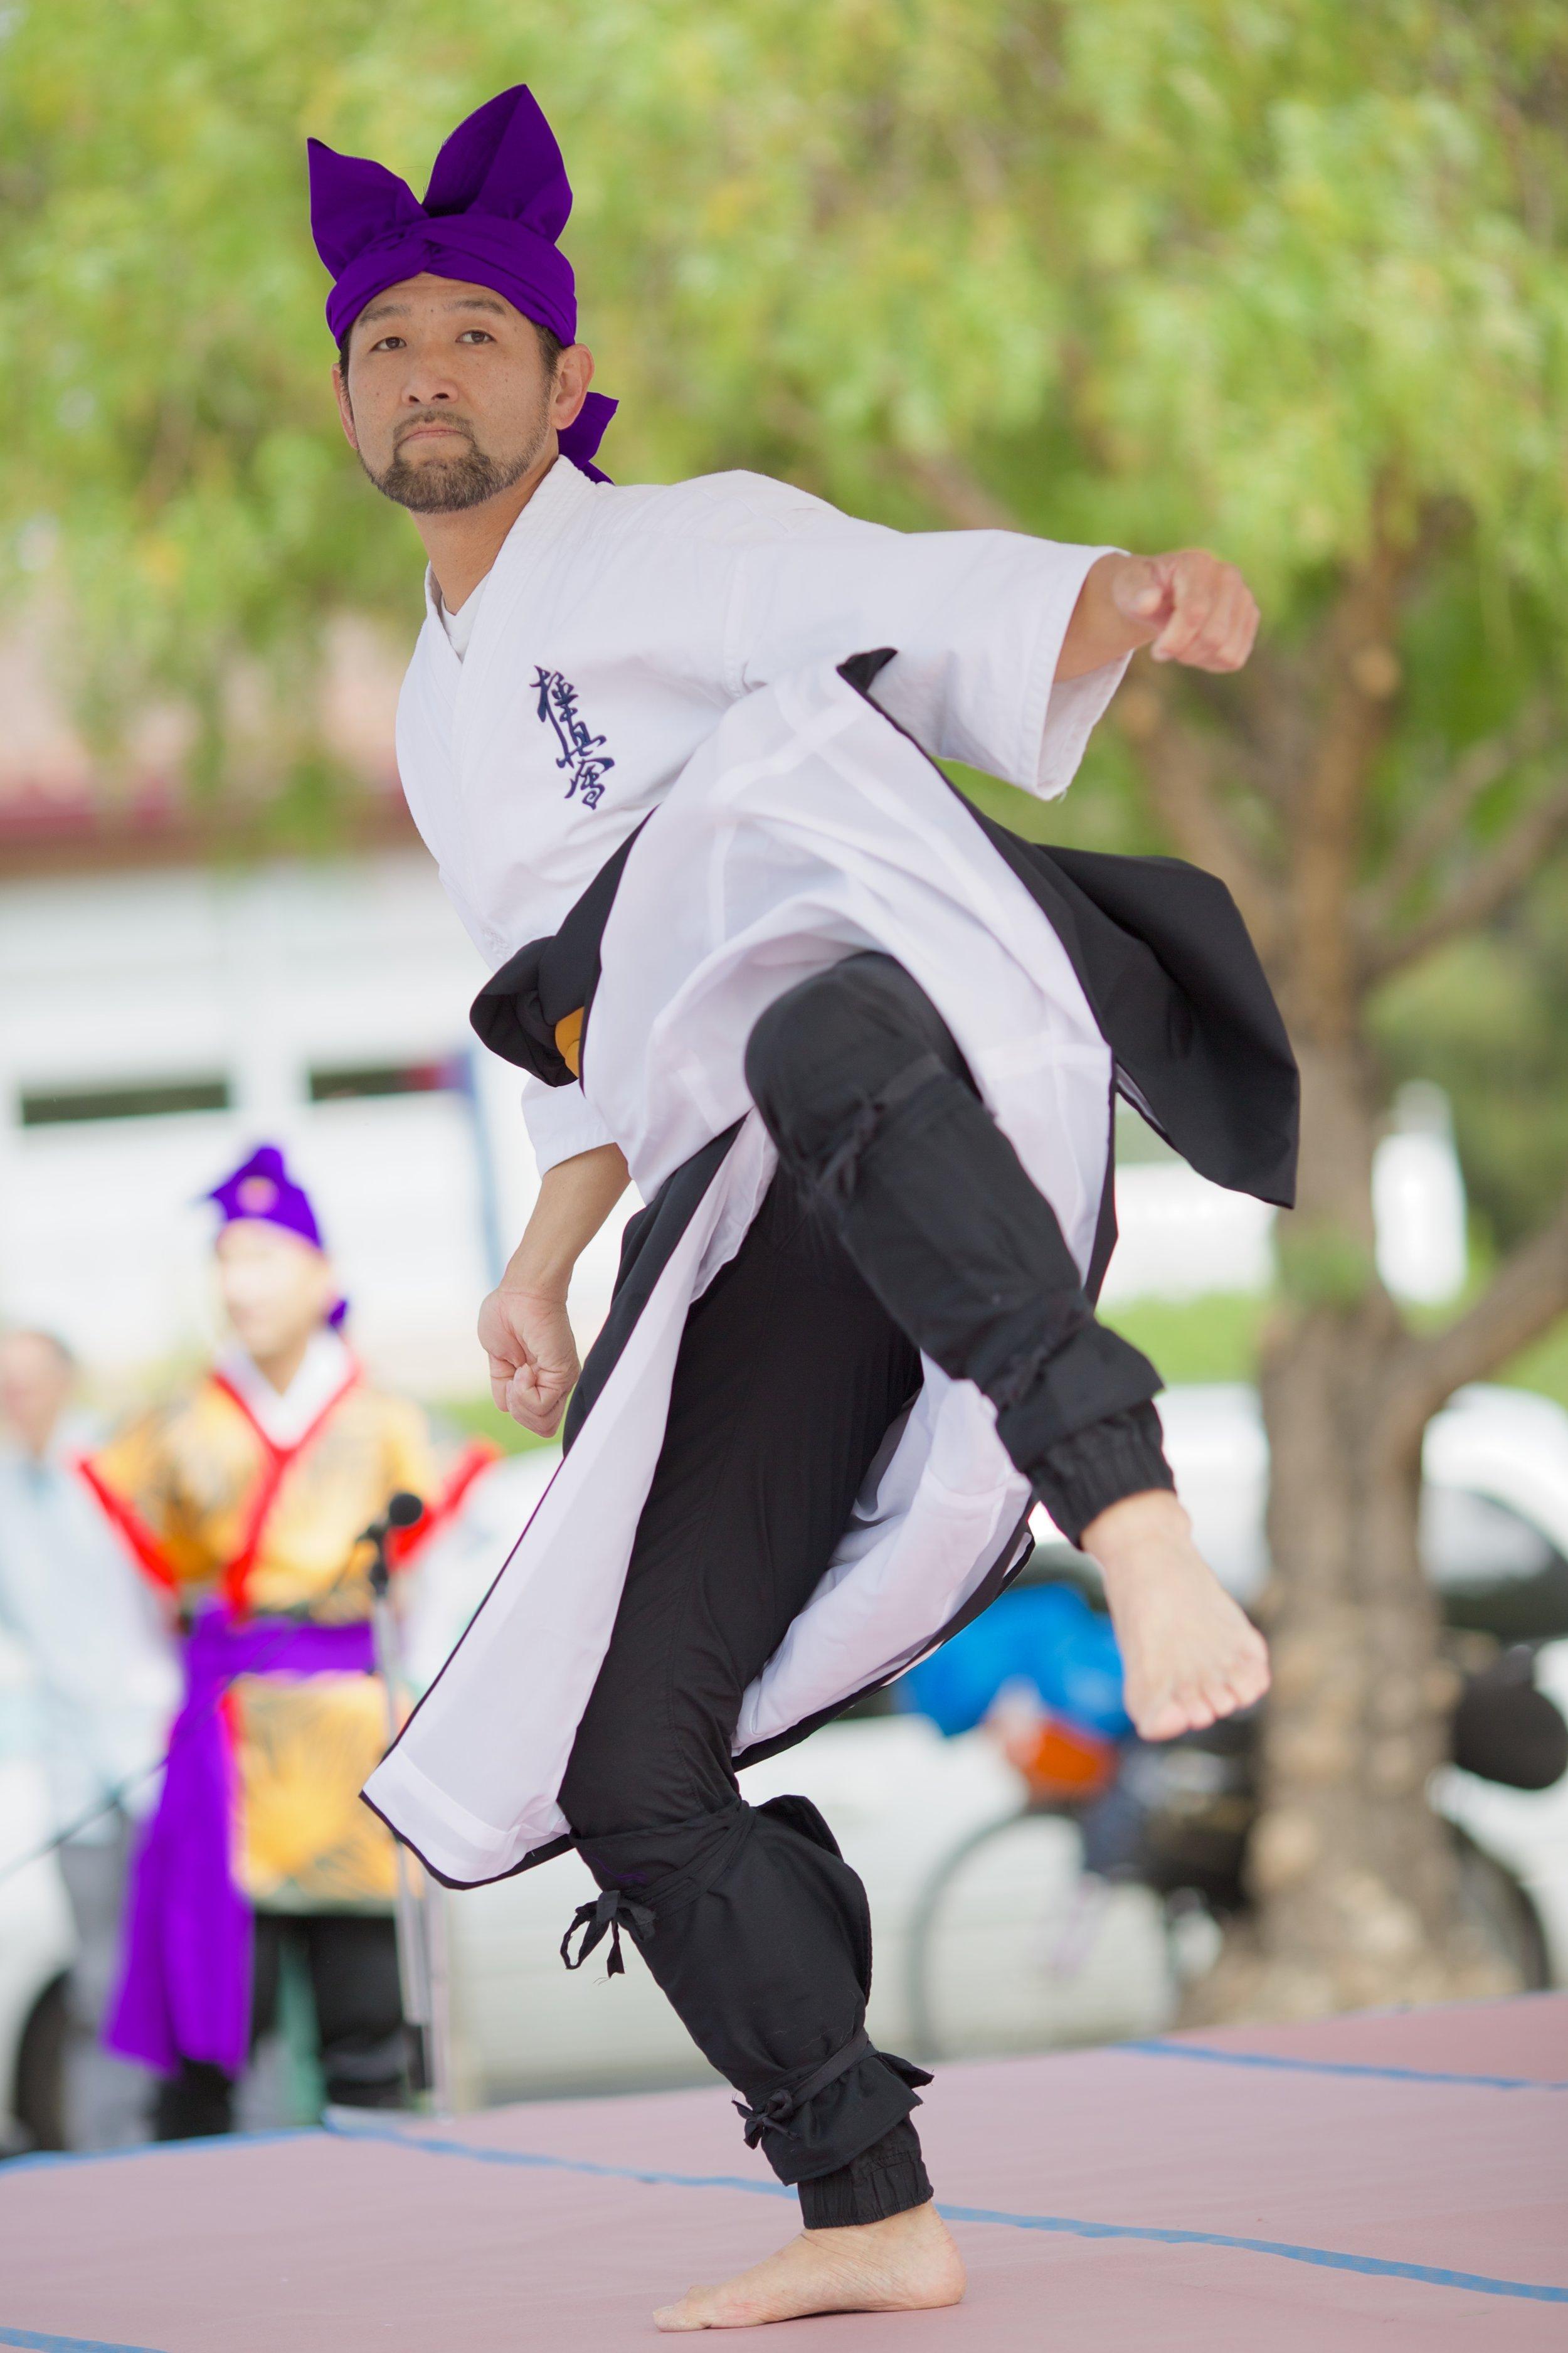 ohtori-no-kai---japanese-cultural-fair-of-santa-cruz-2015_19600983301_o.jpg